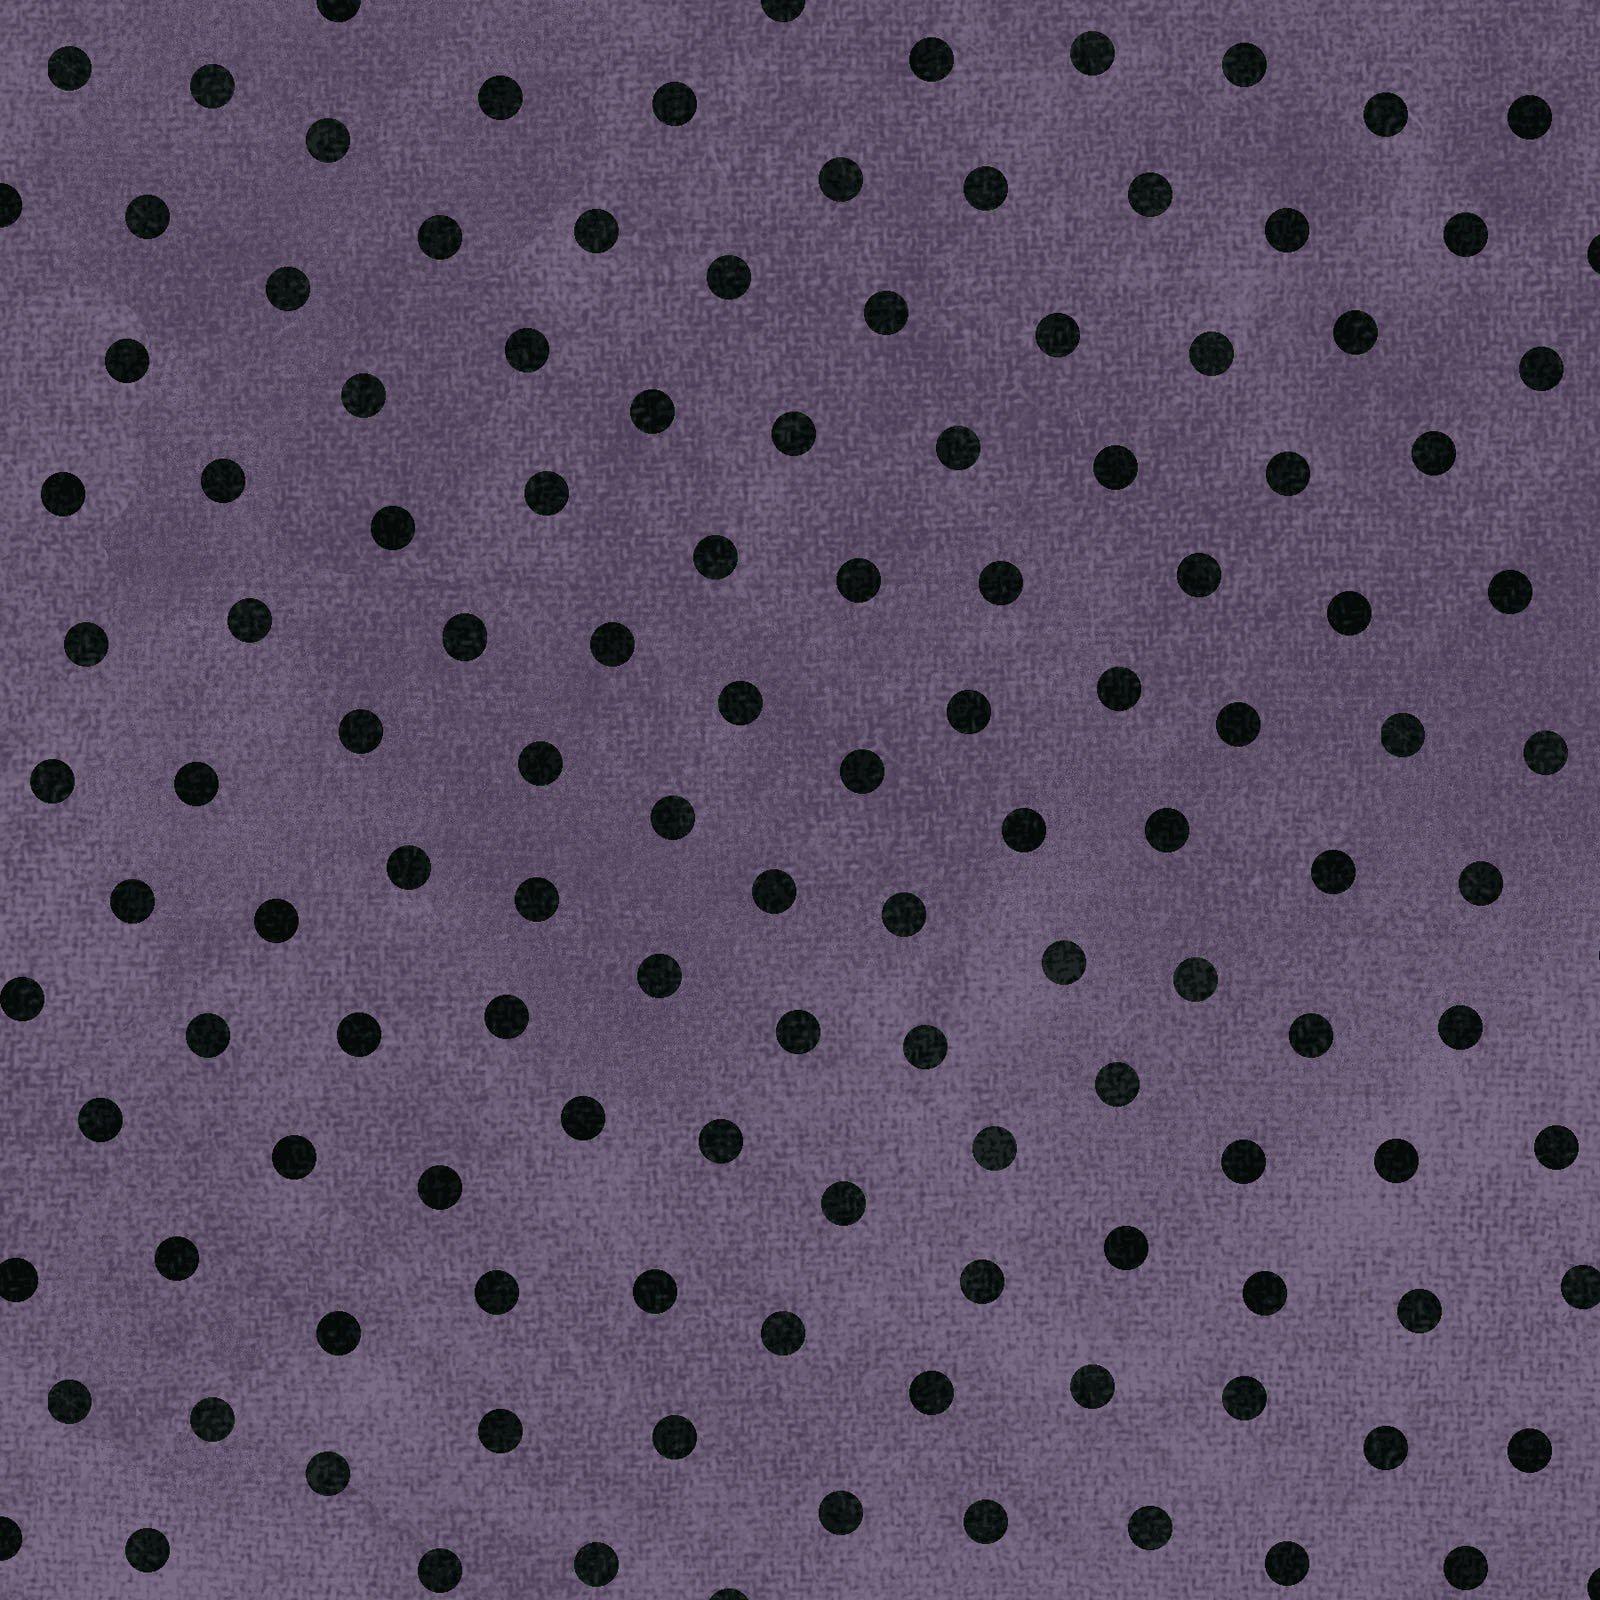 Woolies Flannel Polka Dots Purple (MASF18506-V)